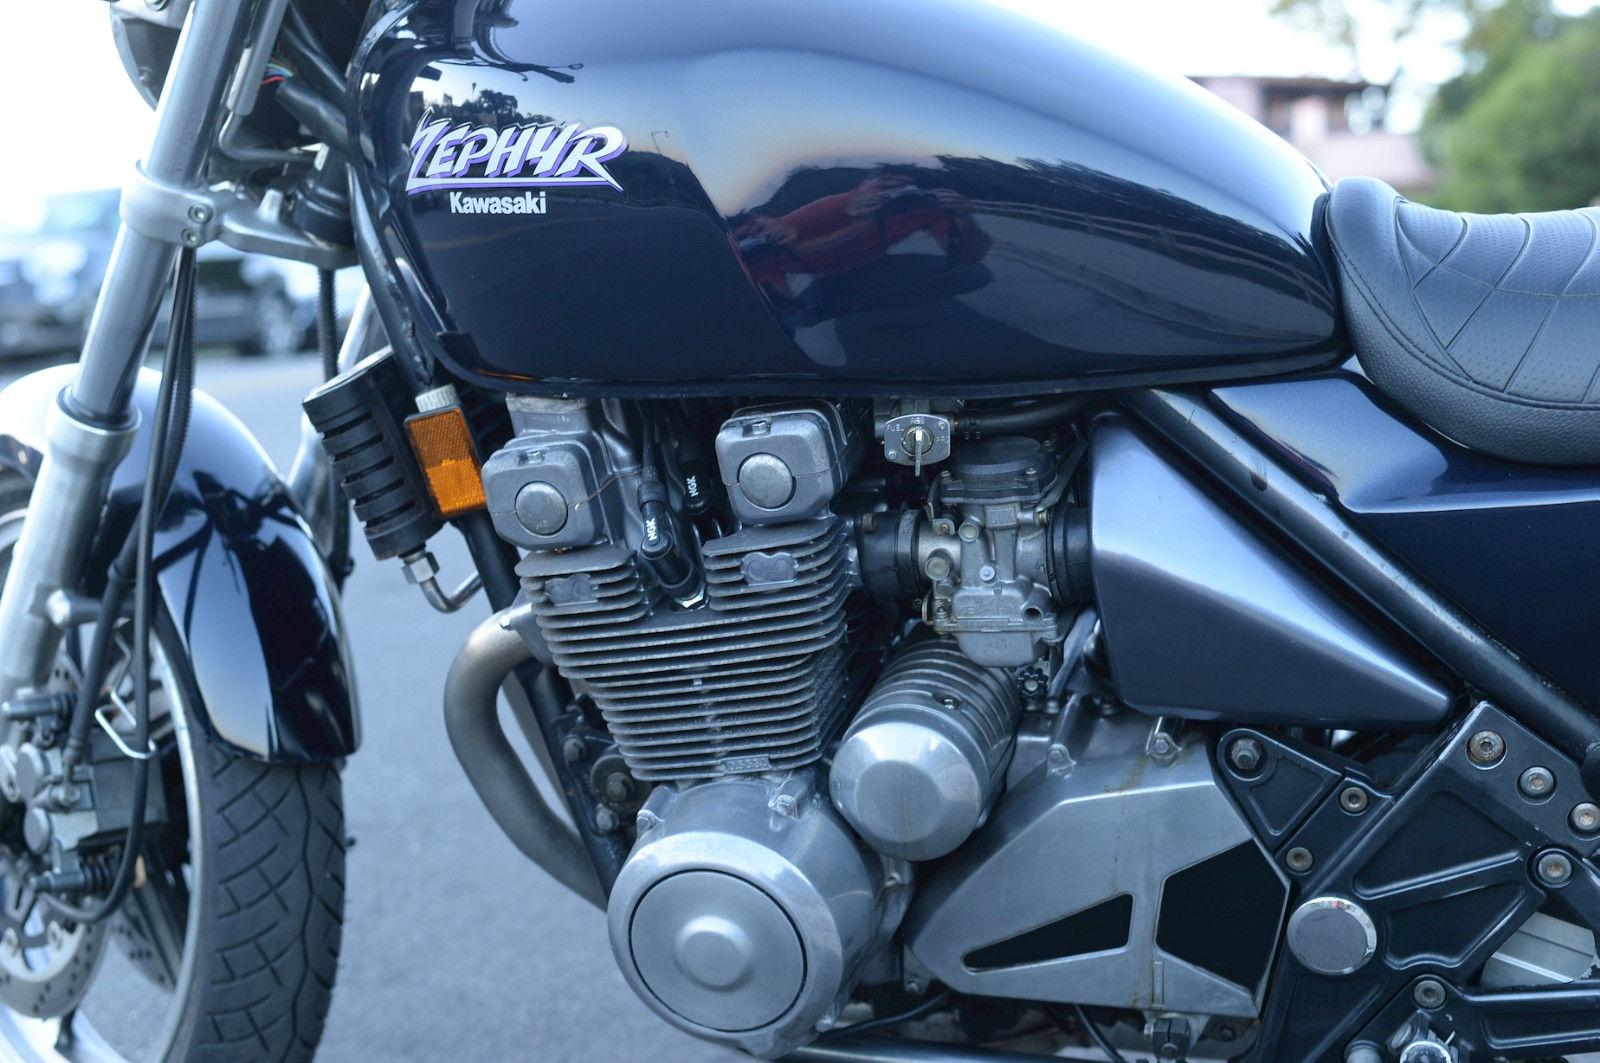 1990 Kawasaki Zephyr 550 - YouTube